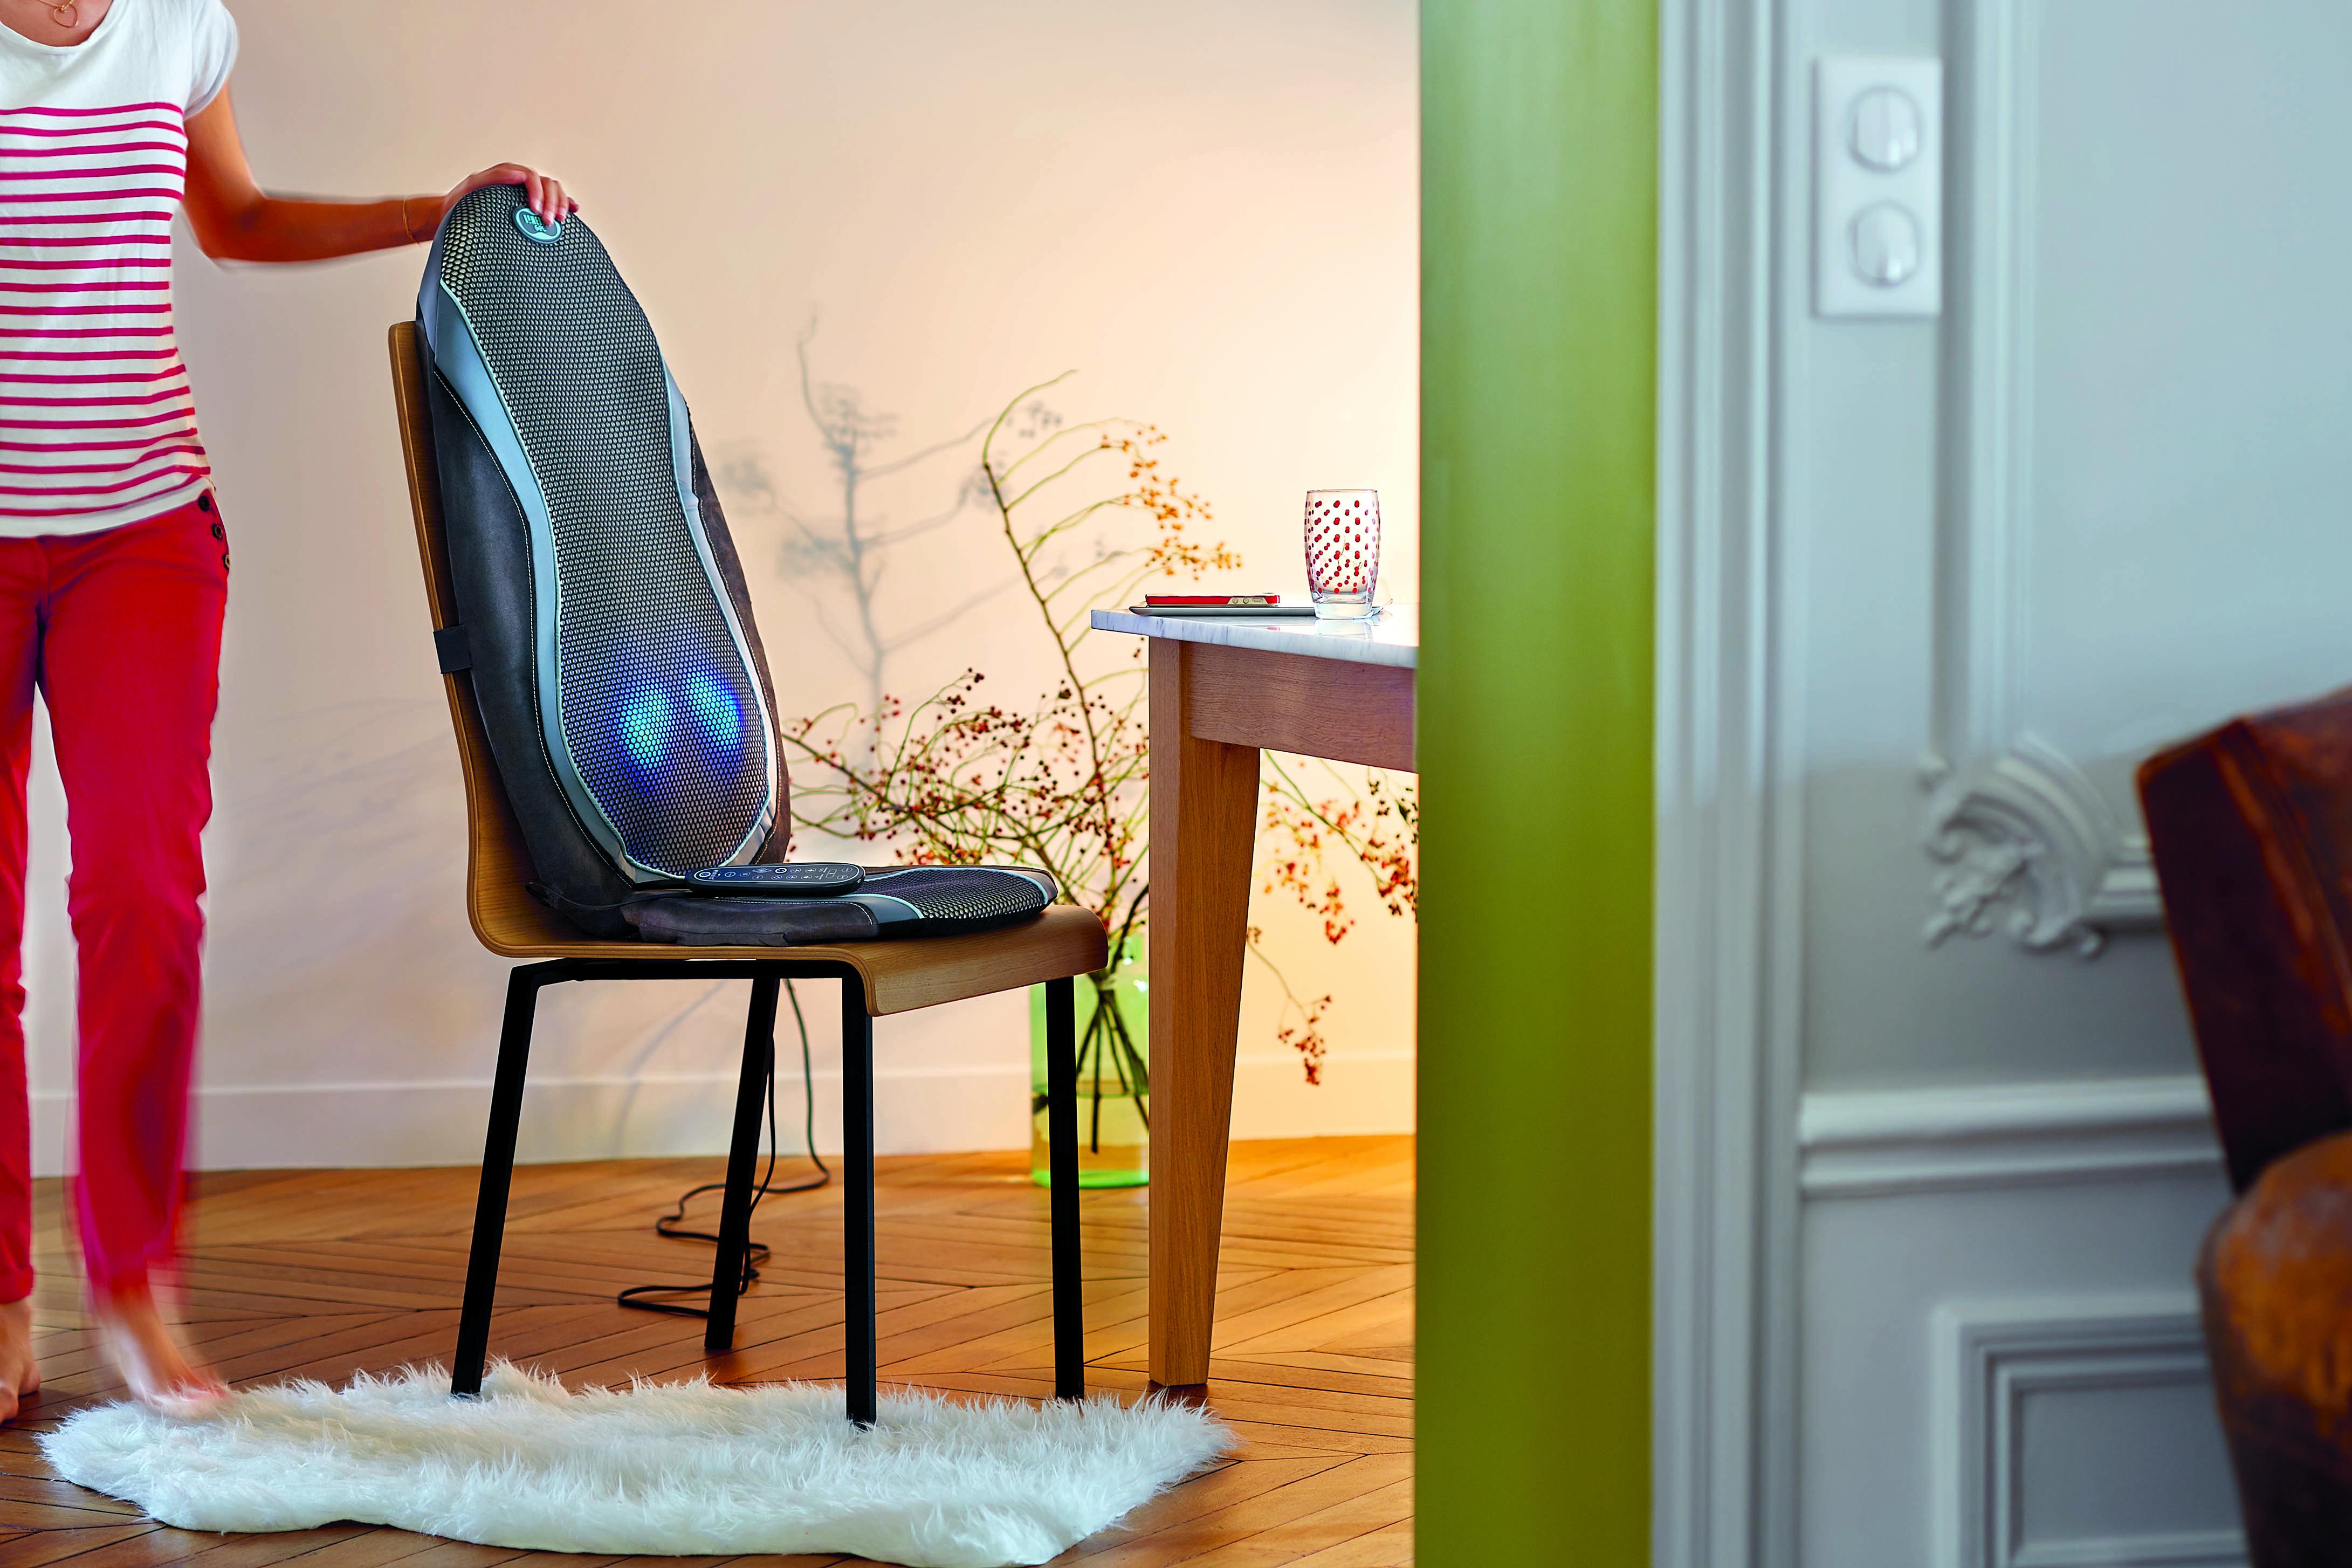 stylisme nature d couvertes marion alberge d coratrice. Black Bedroom Furniture Sets. Home Design Ideas